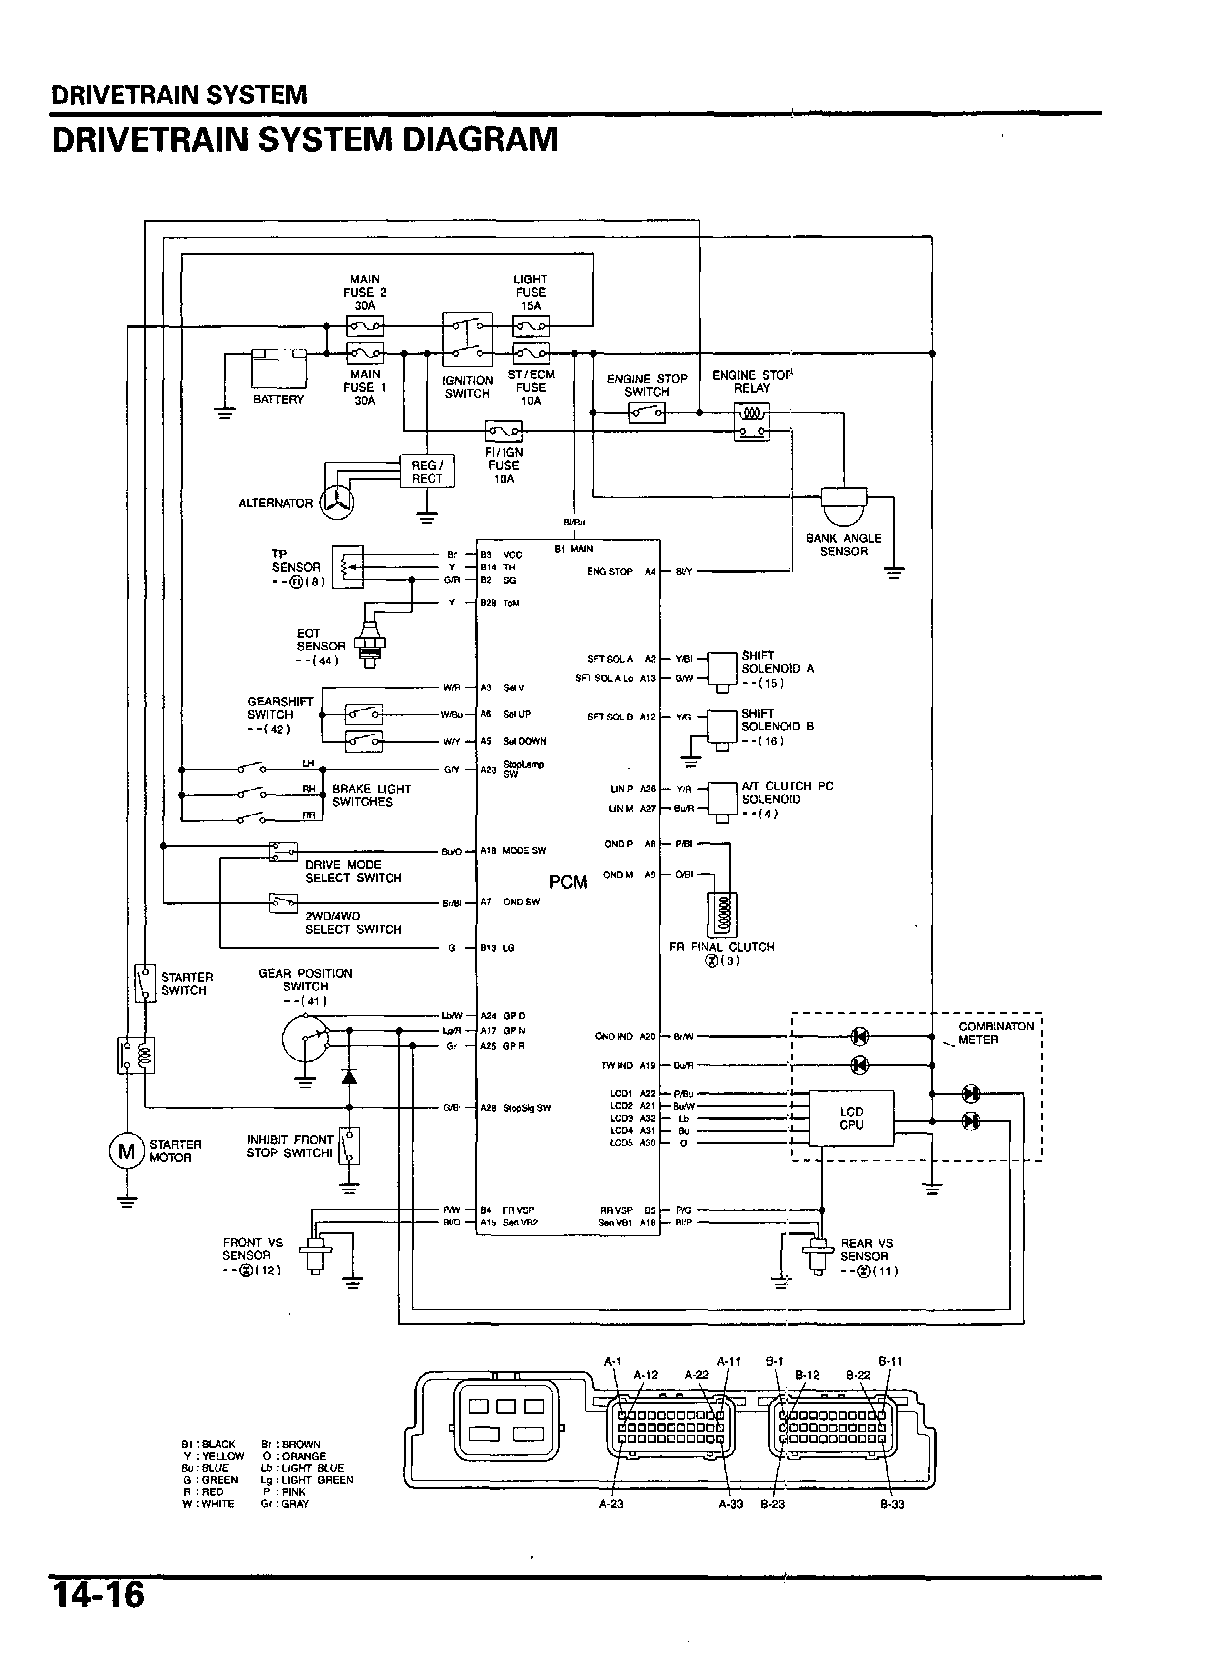 Honda Rincon Wiring Diagram | Wiring Diagram on trx450er wiring diagram, trx 300ex wiring diagram, rancher es wiring diagram, trx250x wiring diagram, 400ex wiring diagram,